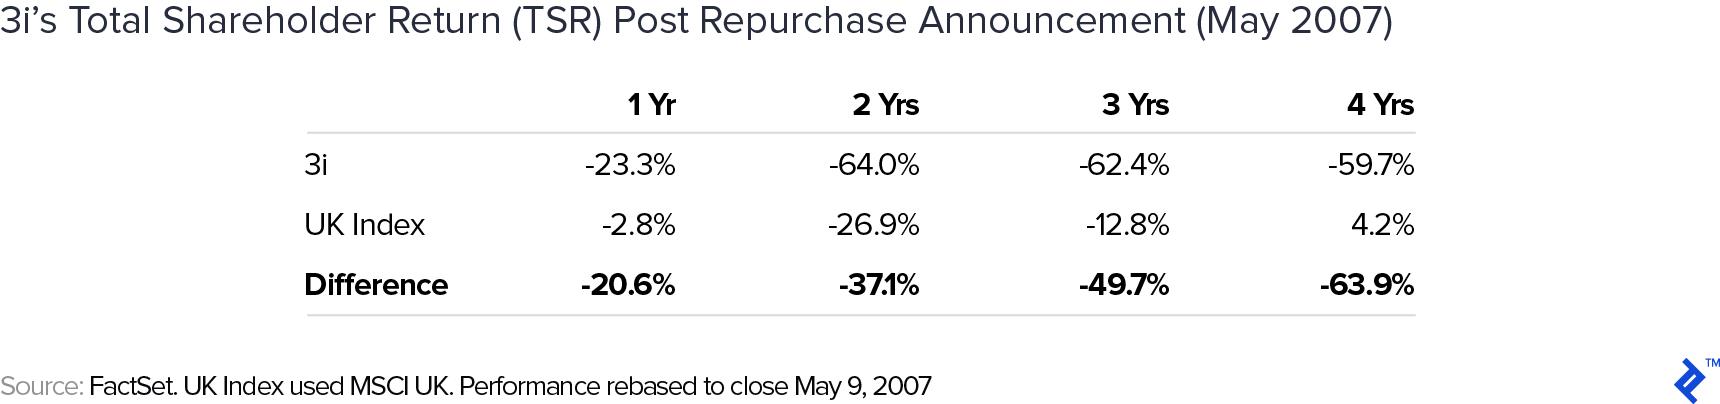 3i's total shareholder return (TSR) post repurchase announcement (May 2007)